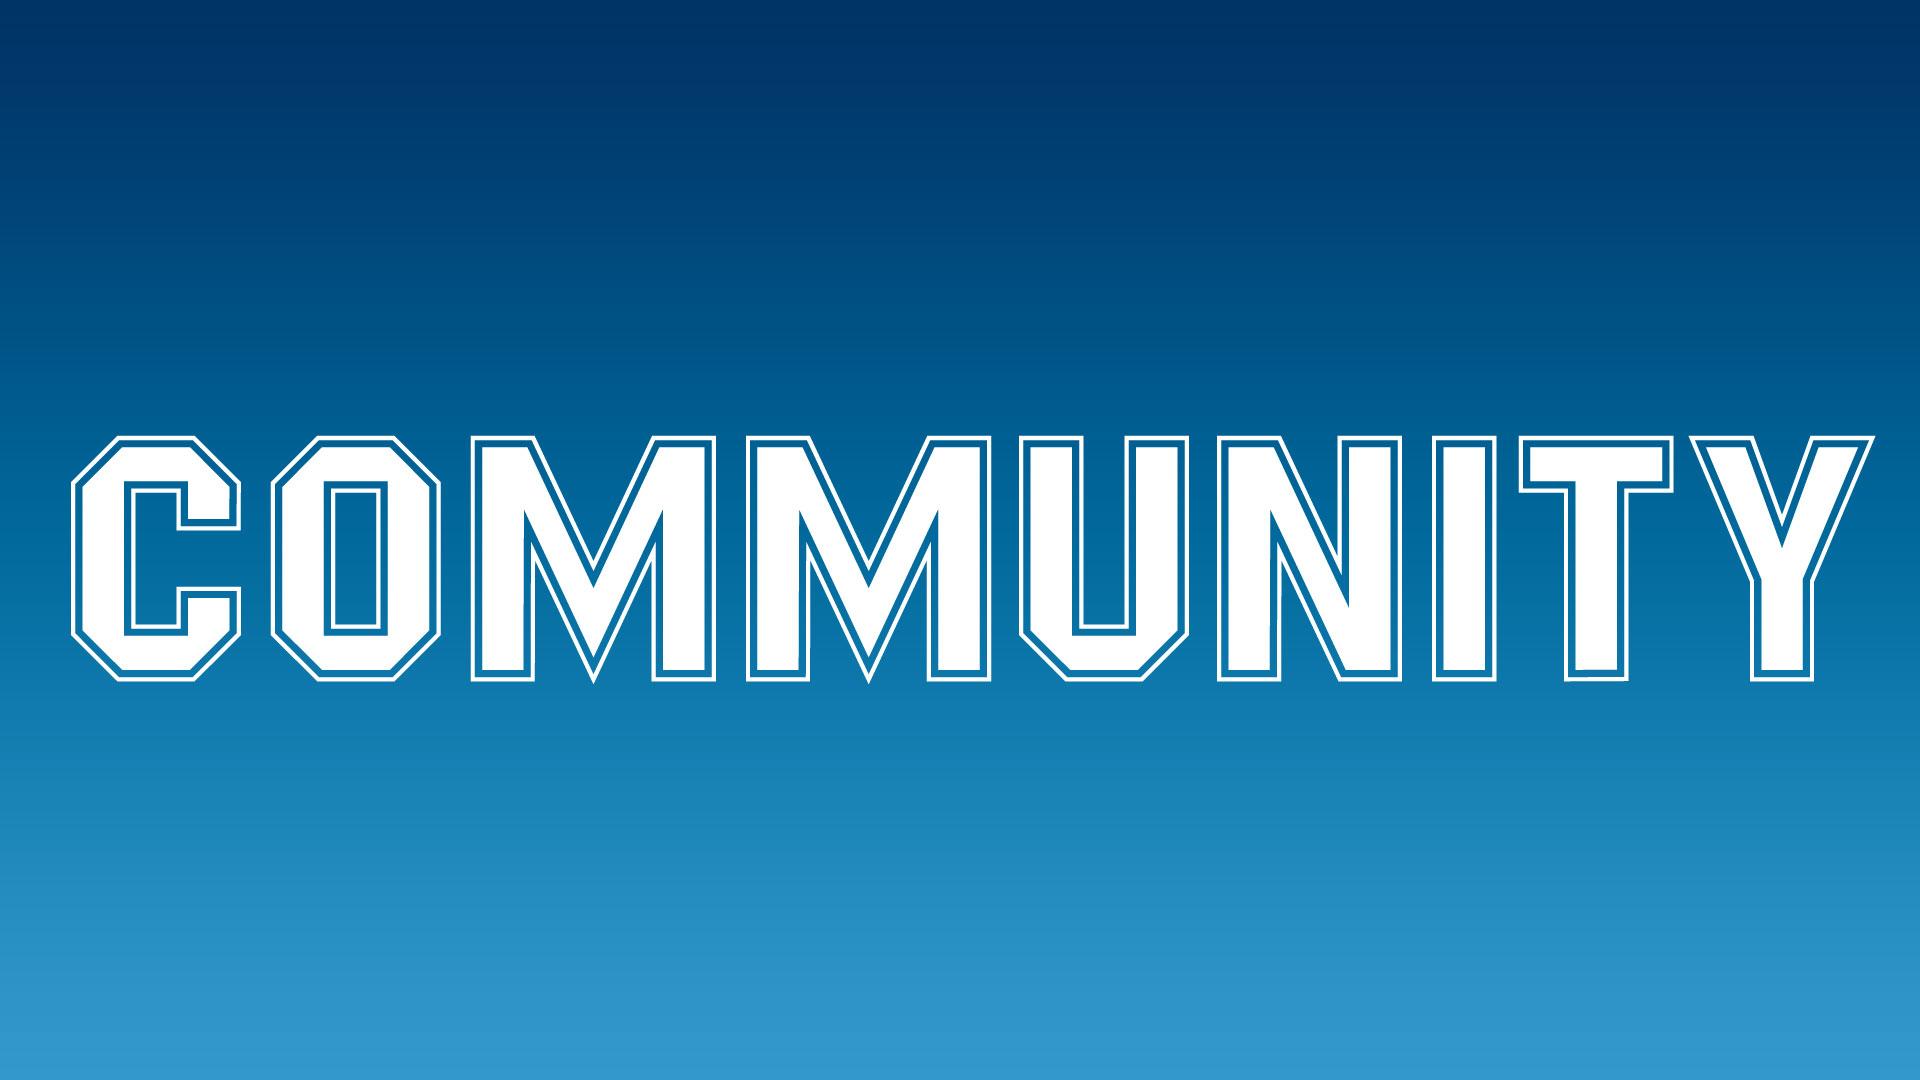 Community wallpaper 7